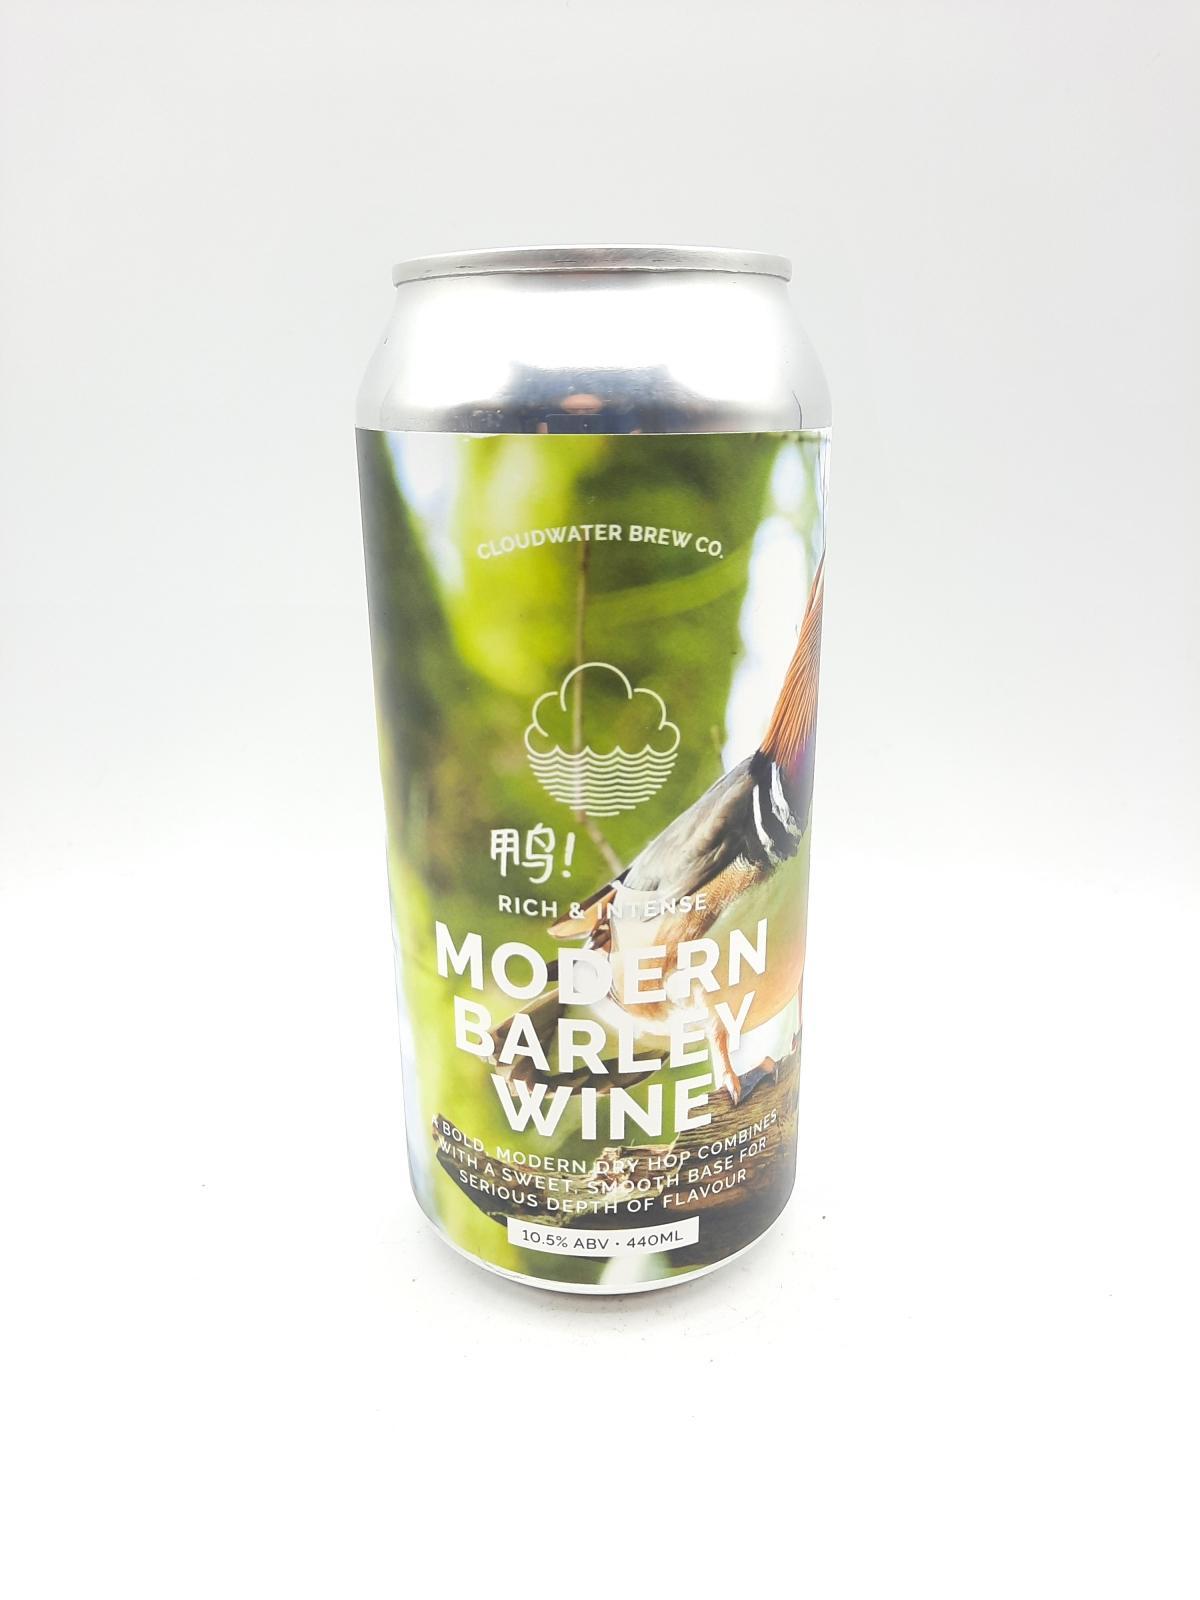 Image Modern Barleywine